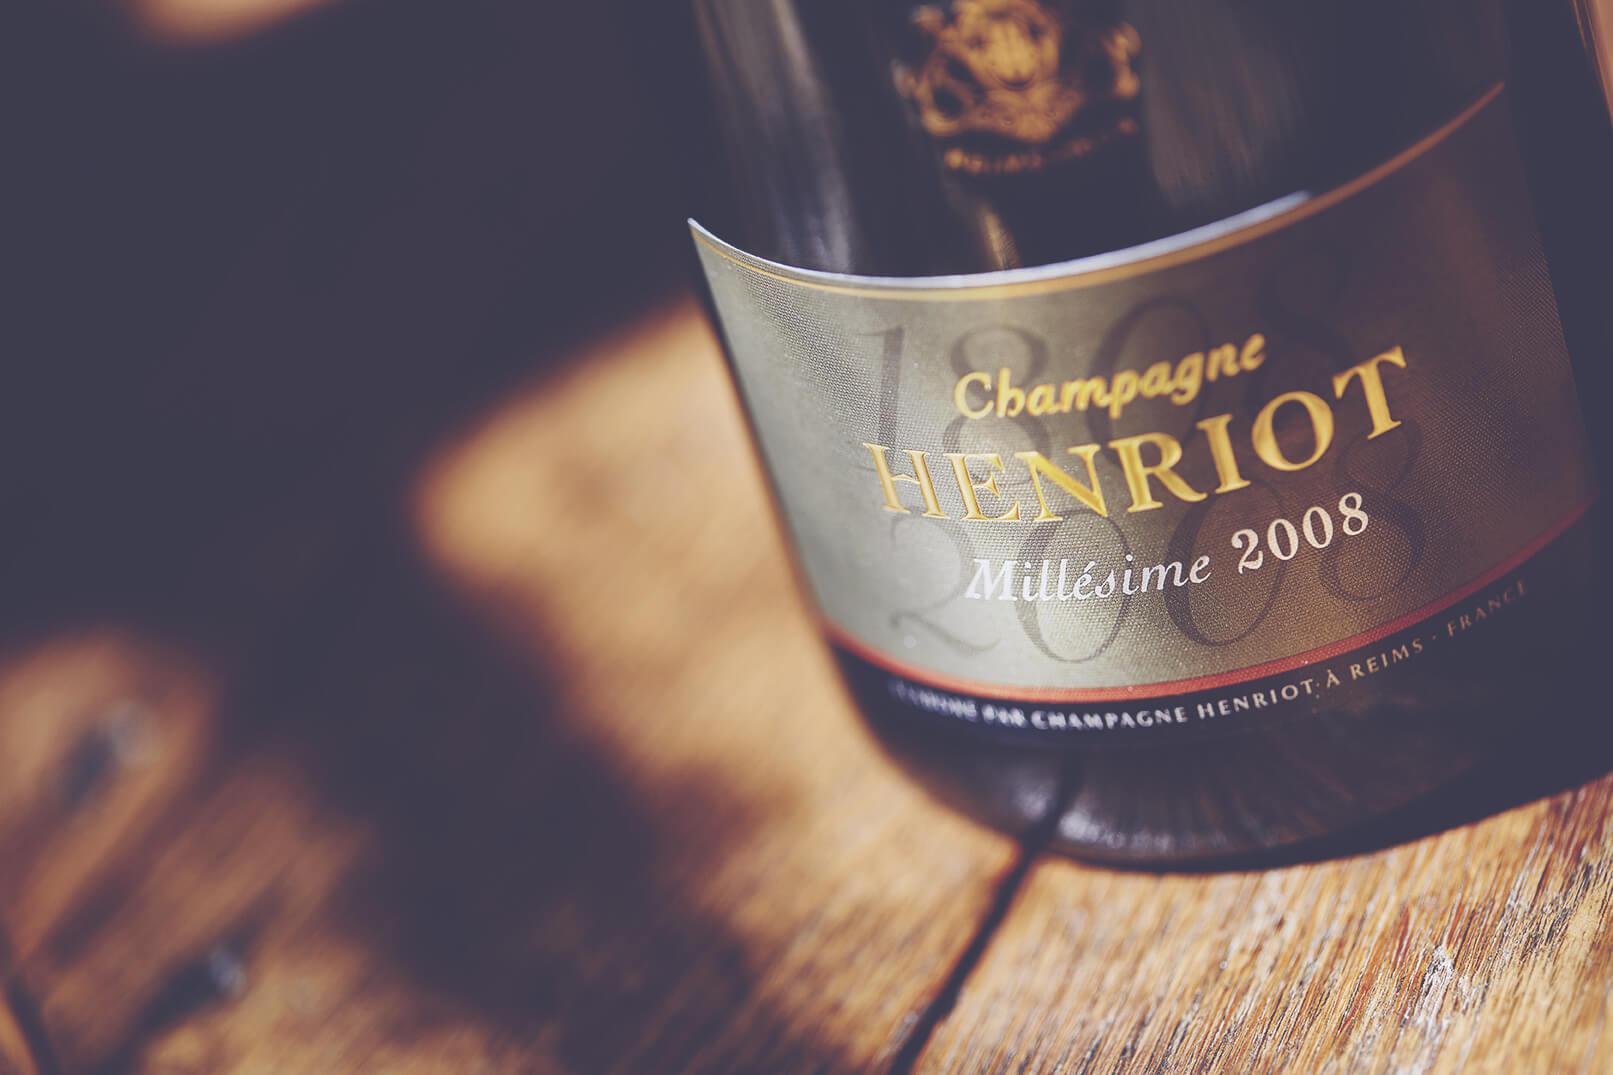 Champagne Henriot 2008